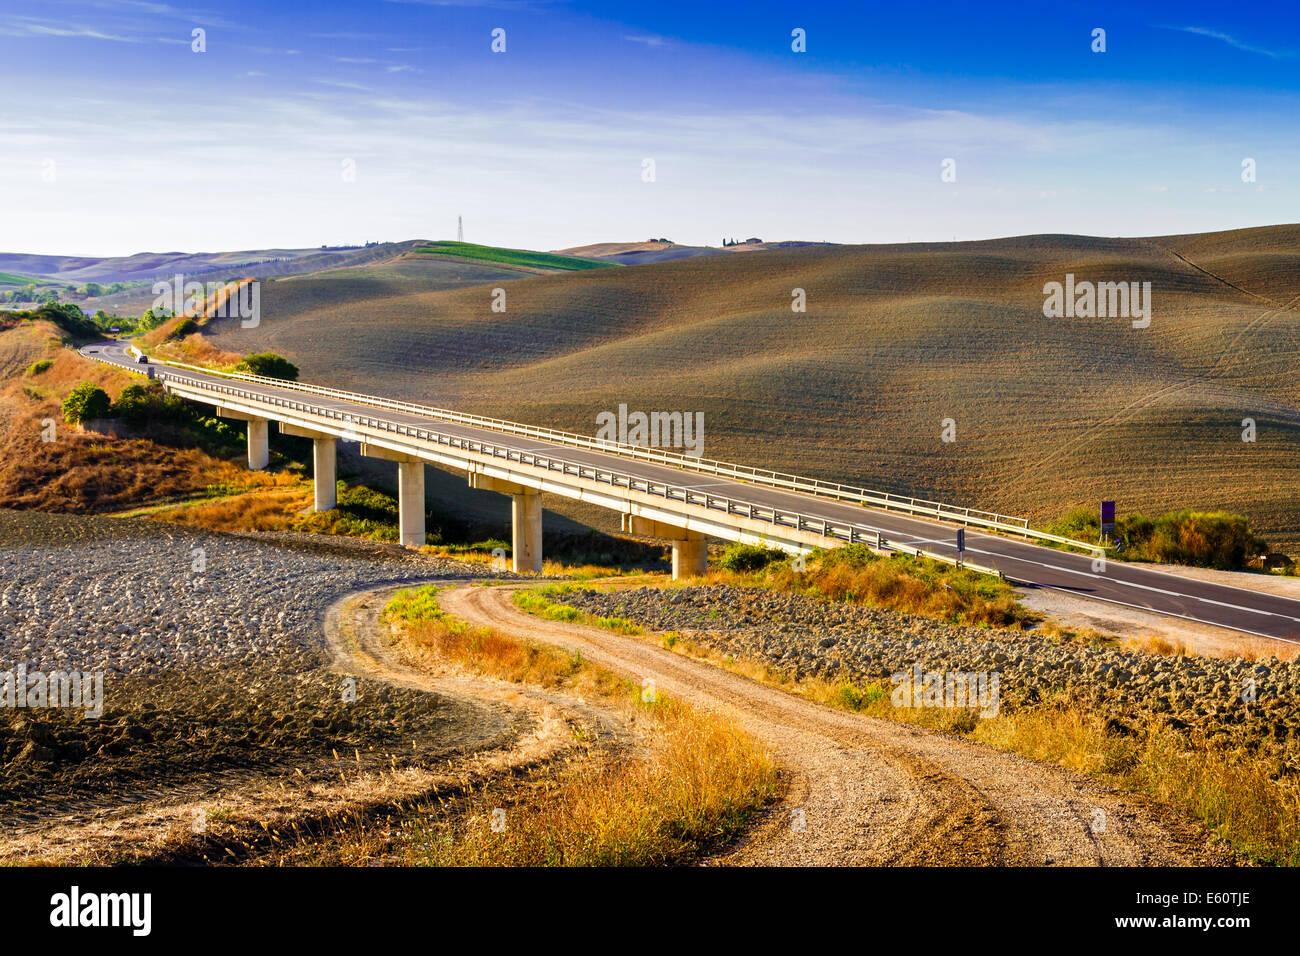 Brücke und Hügel an einem Sommertag in Crete Senesi in Toskana, Italien Stockbild